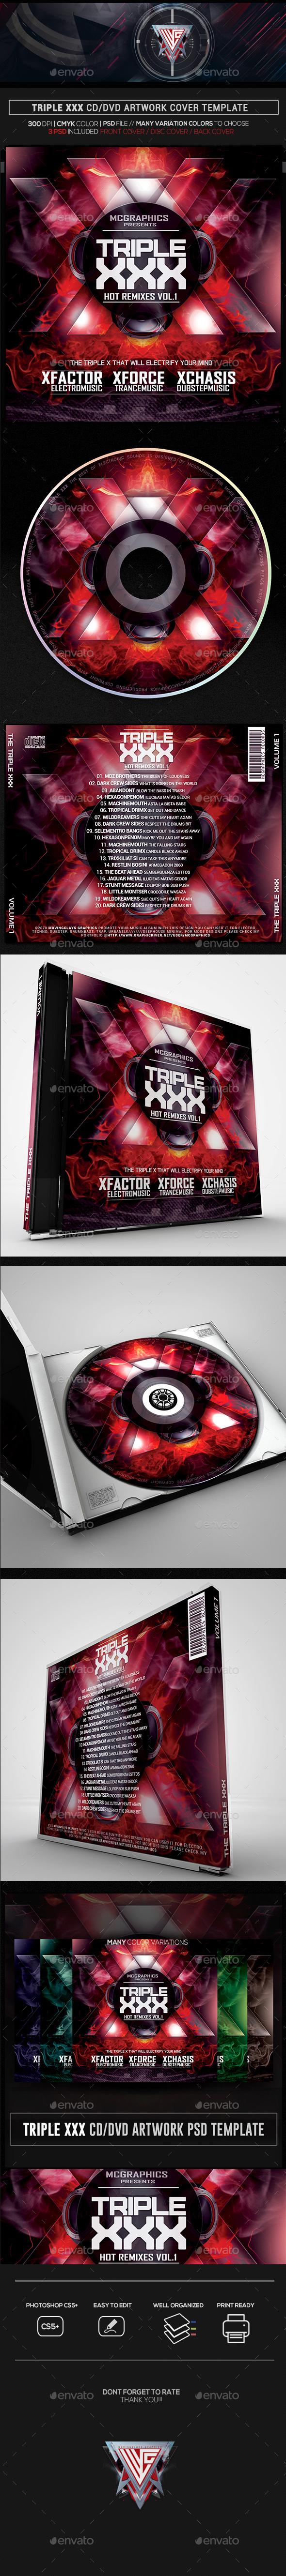 Triple XXX CD/DVD Template - CD & DVD Artwork Print Templates